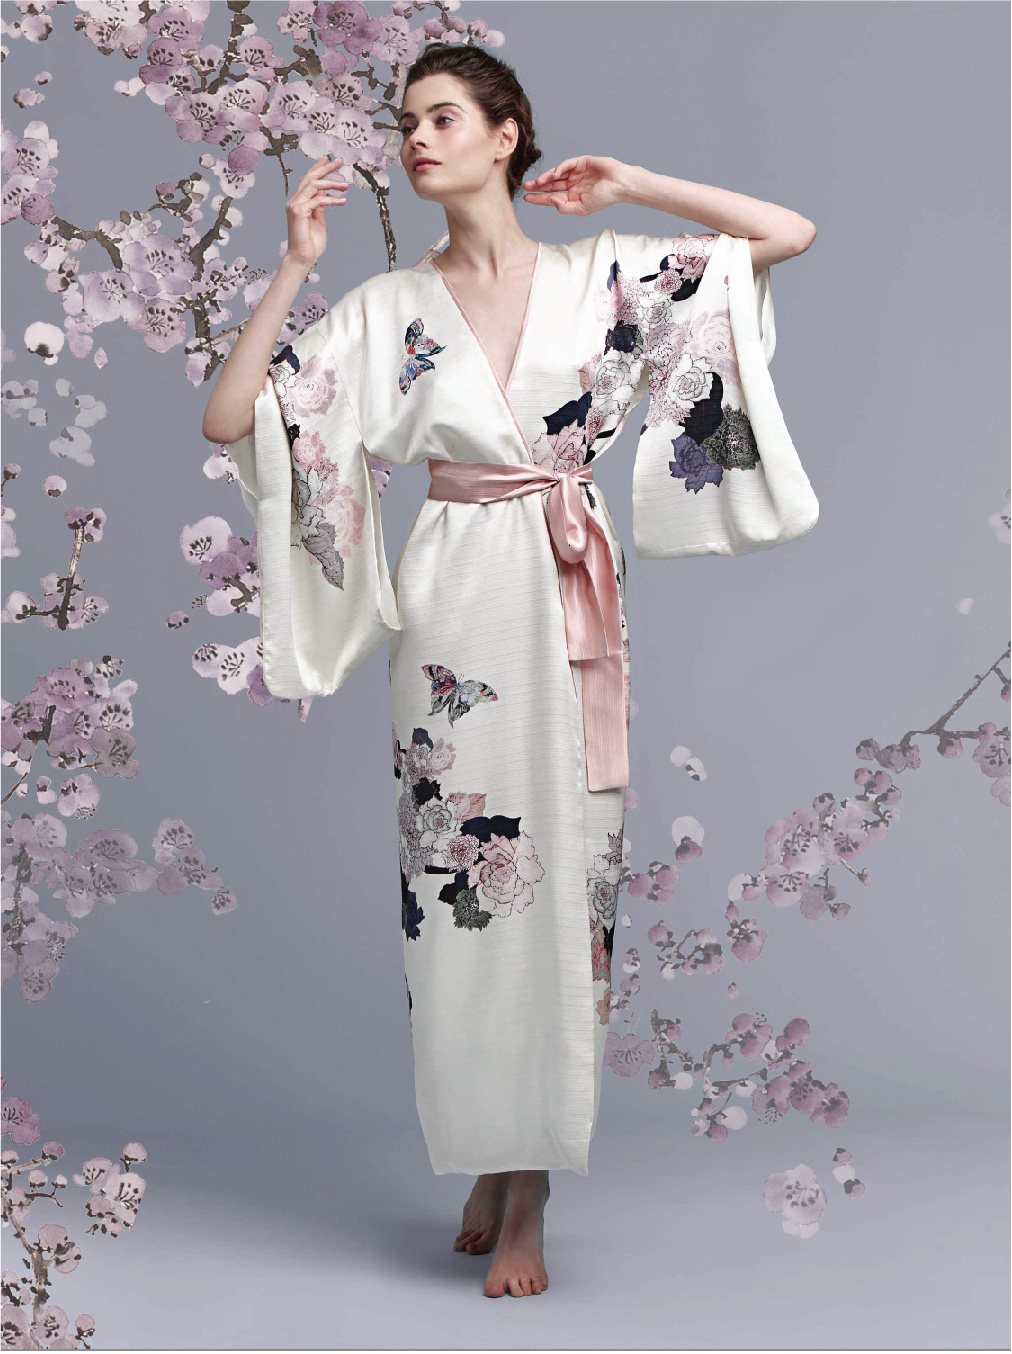 Meng-loungewear-luxury-womenswear-silk-prints-fashion-kimono-handdrawn-bloom-blossom-floral-butterfly-white-pink16.jpg